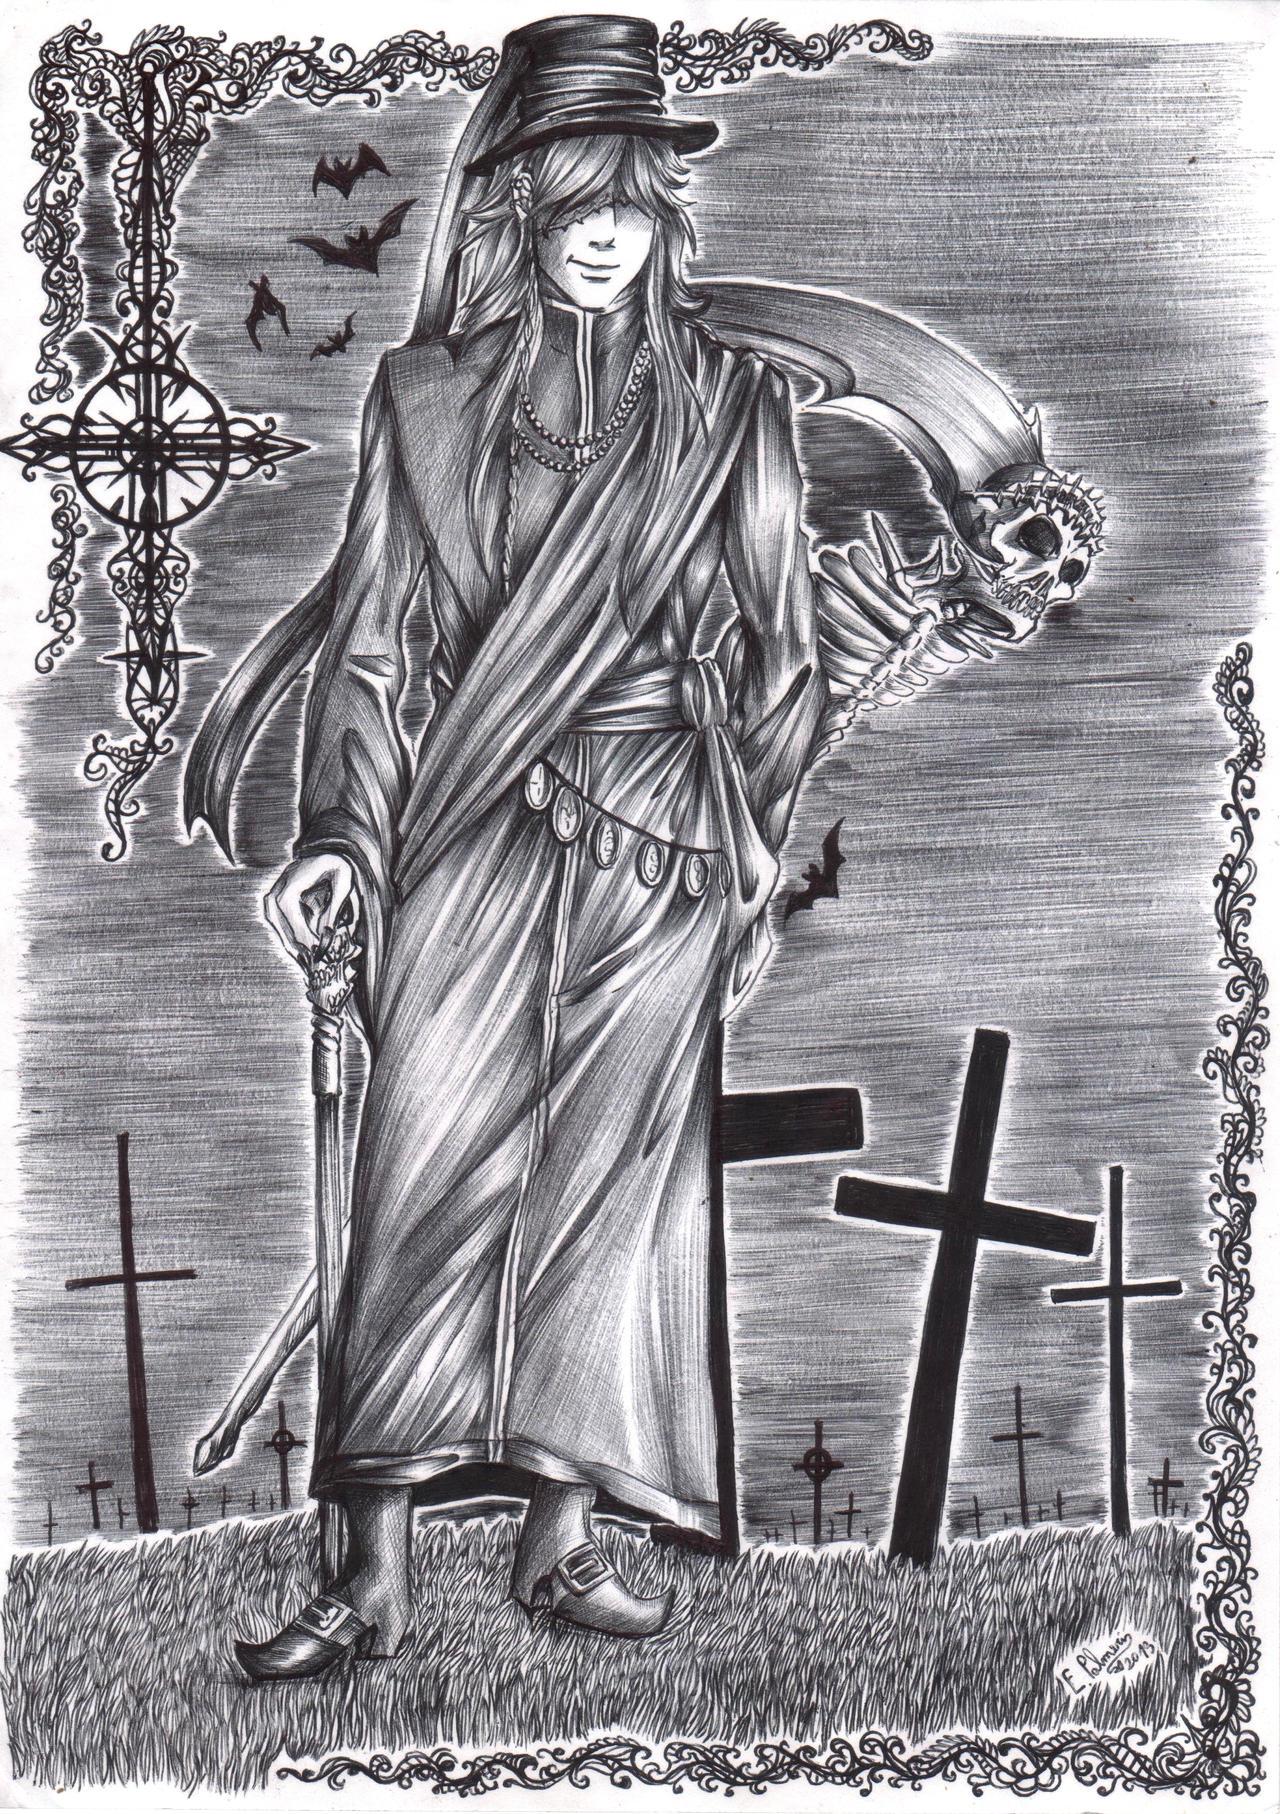 Black Butler - Undertaker by FuriarossaAndMimma